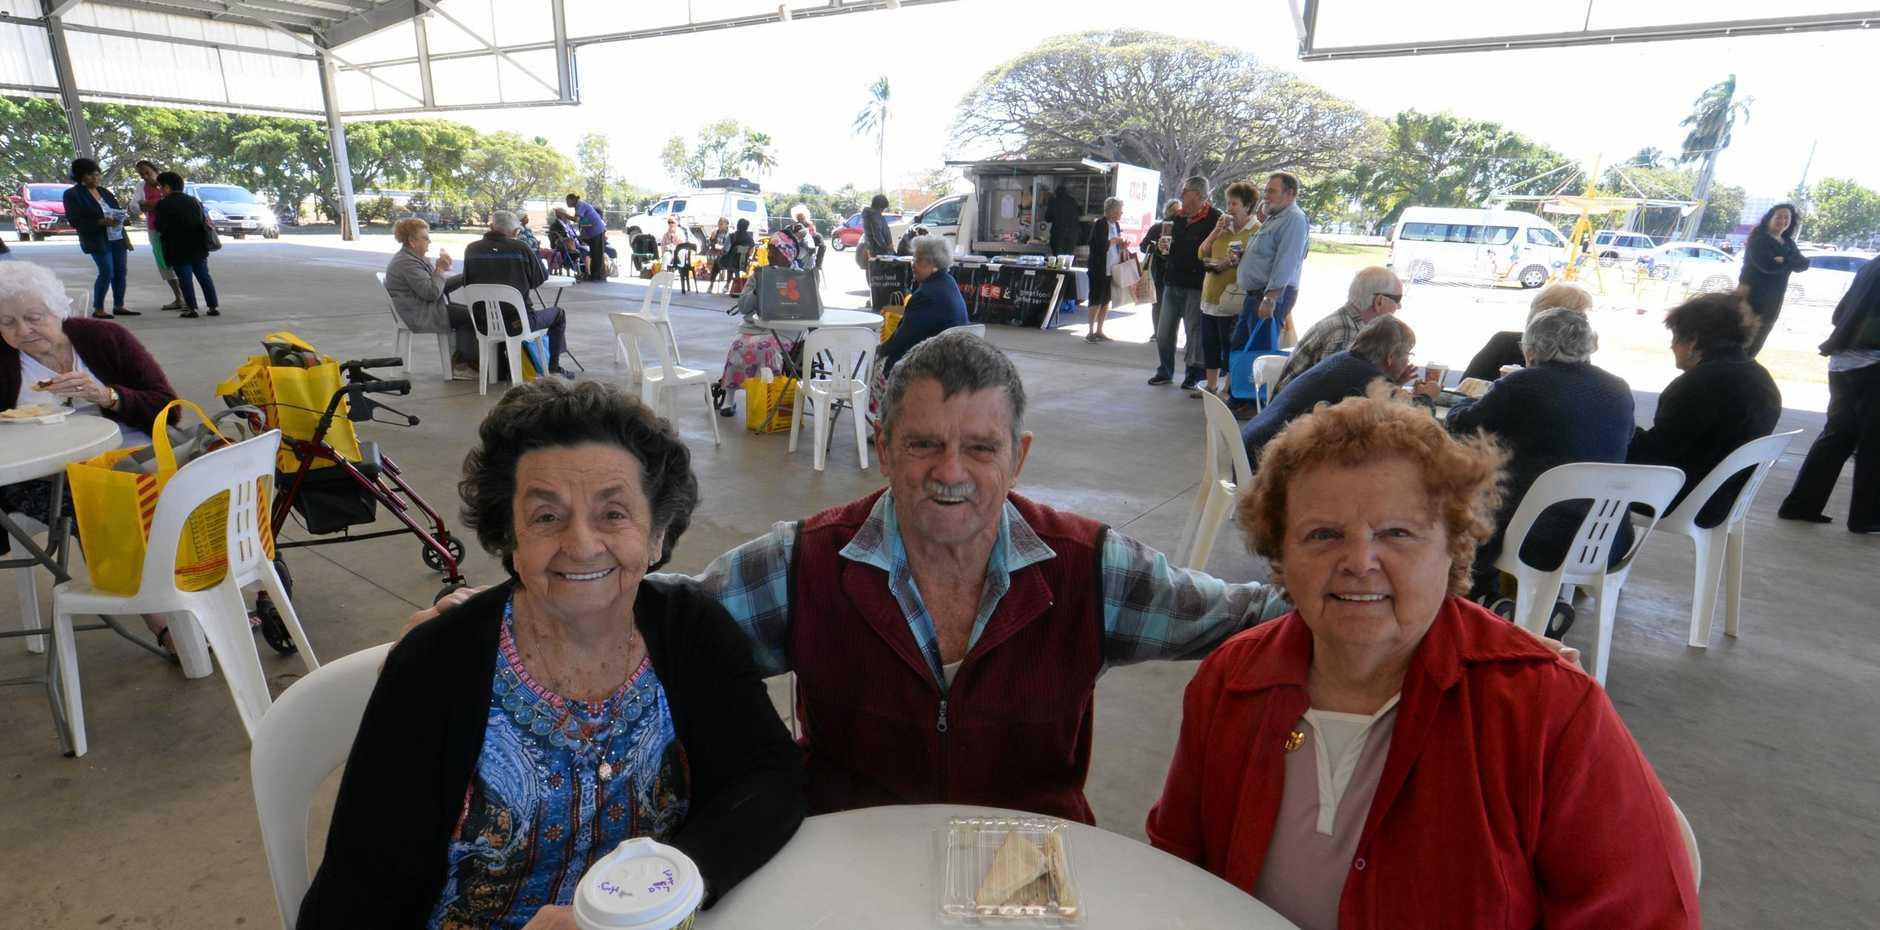 Audrey Ericksen, Rick Shanks and Margaret Dullahide enjoy the Seniors Expo yesterday.